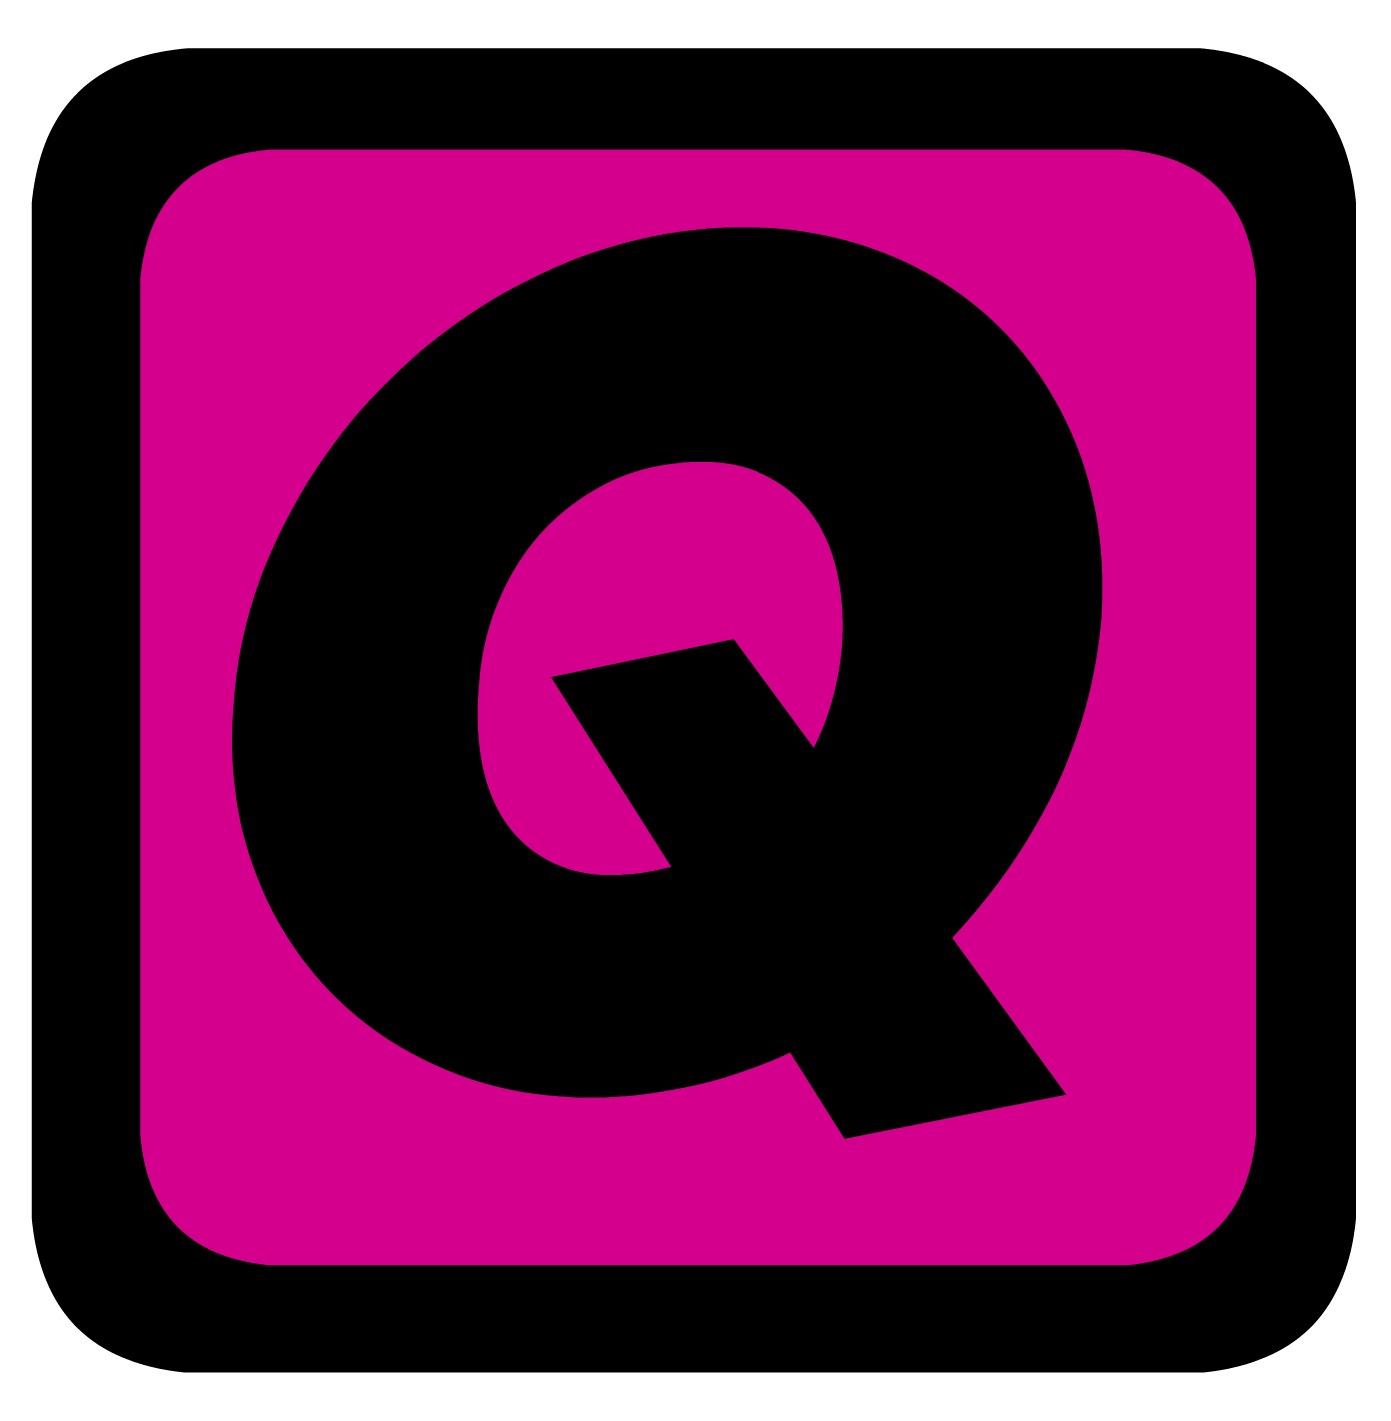 Michelle Paige Blogs Quirky Valentine Round Up